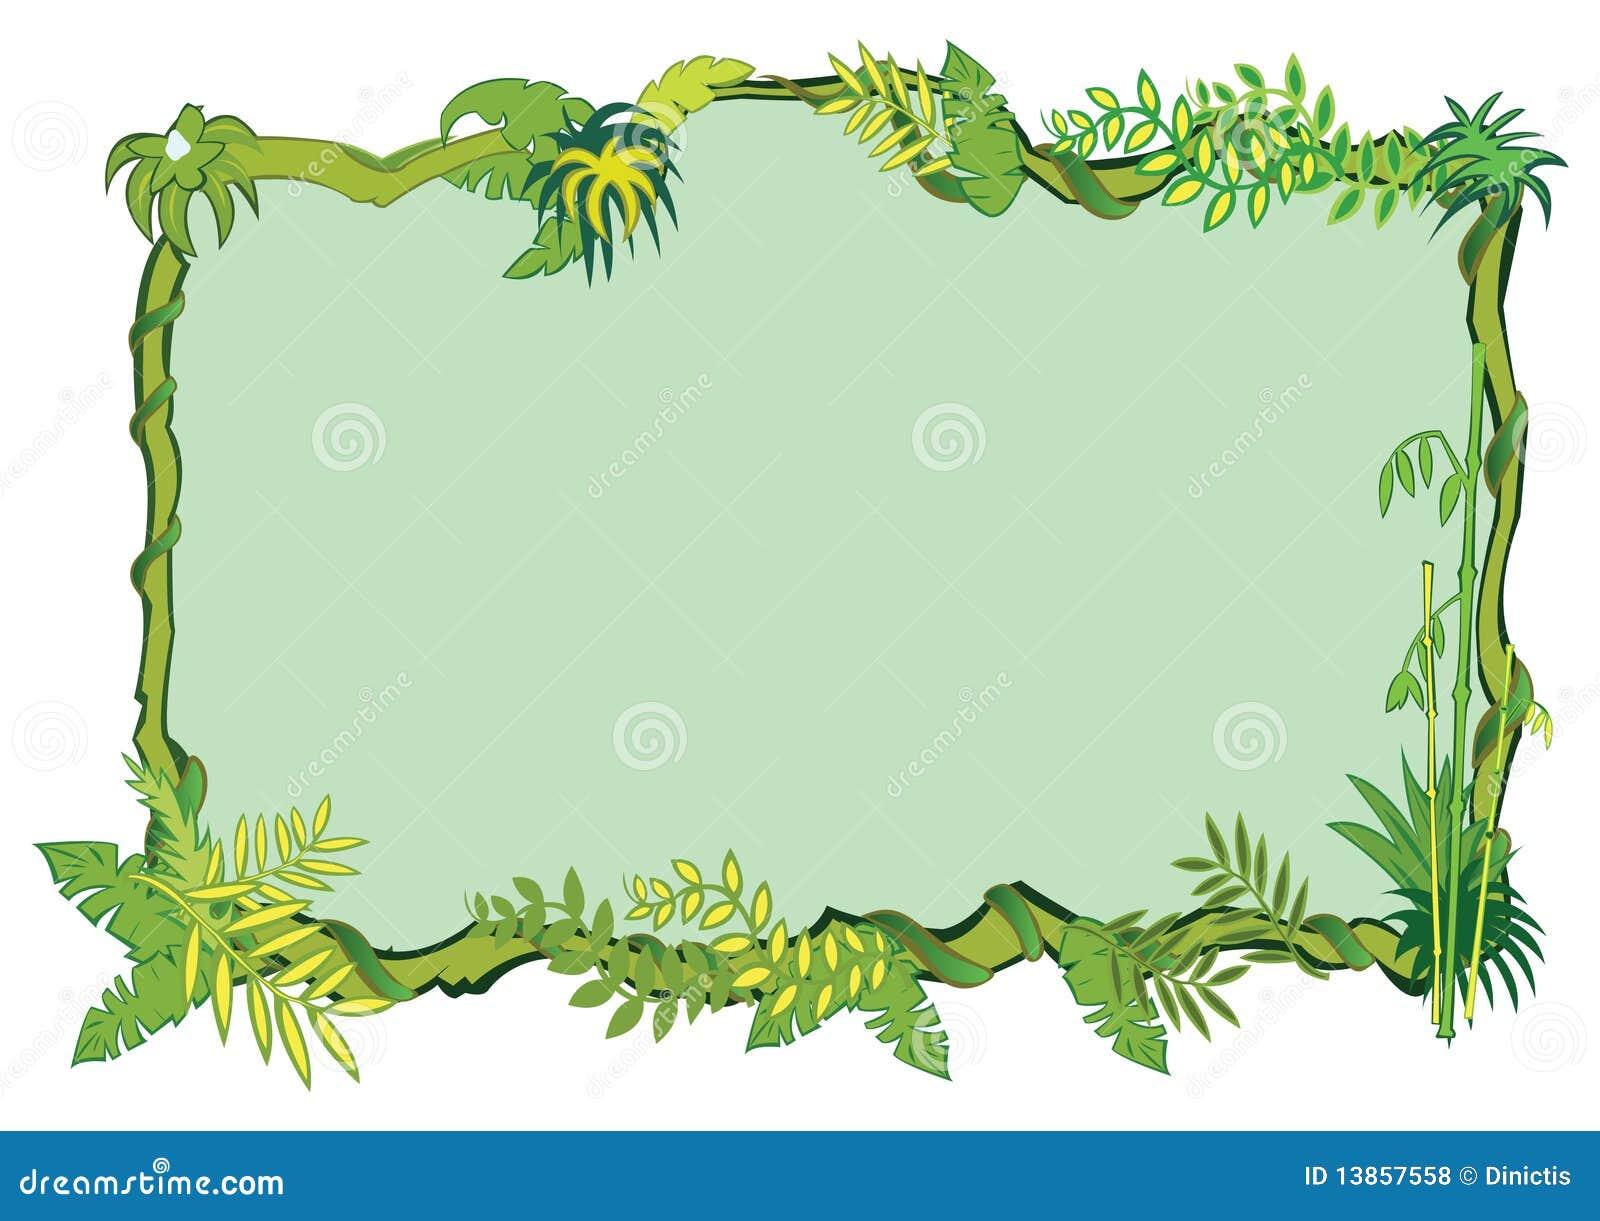 Conceito do frame da selva dentro